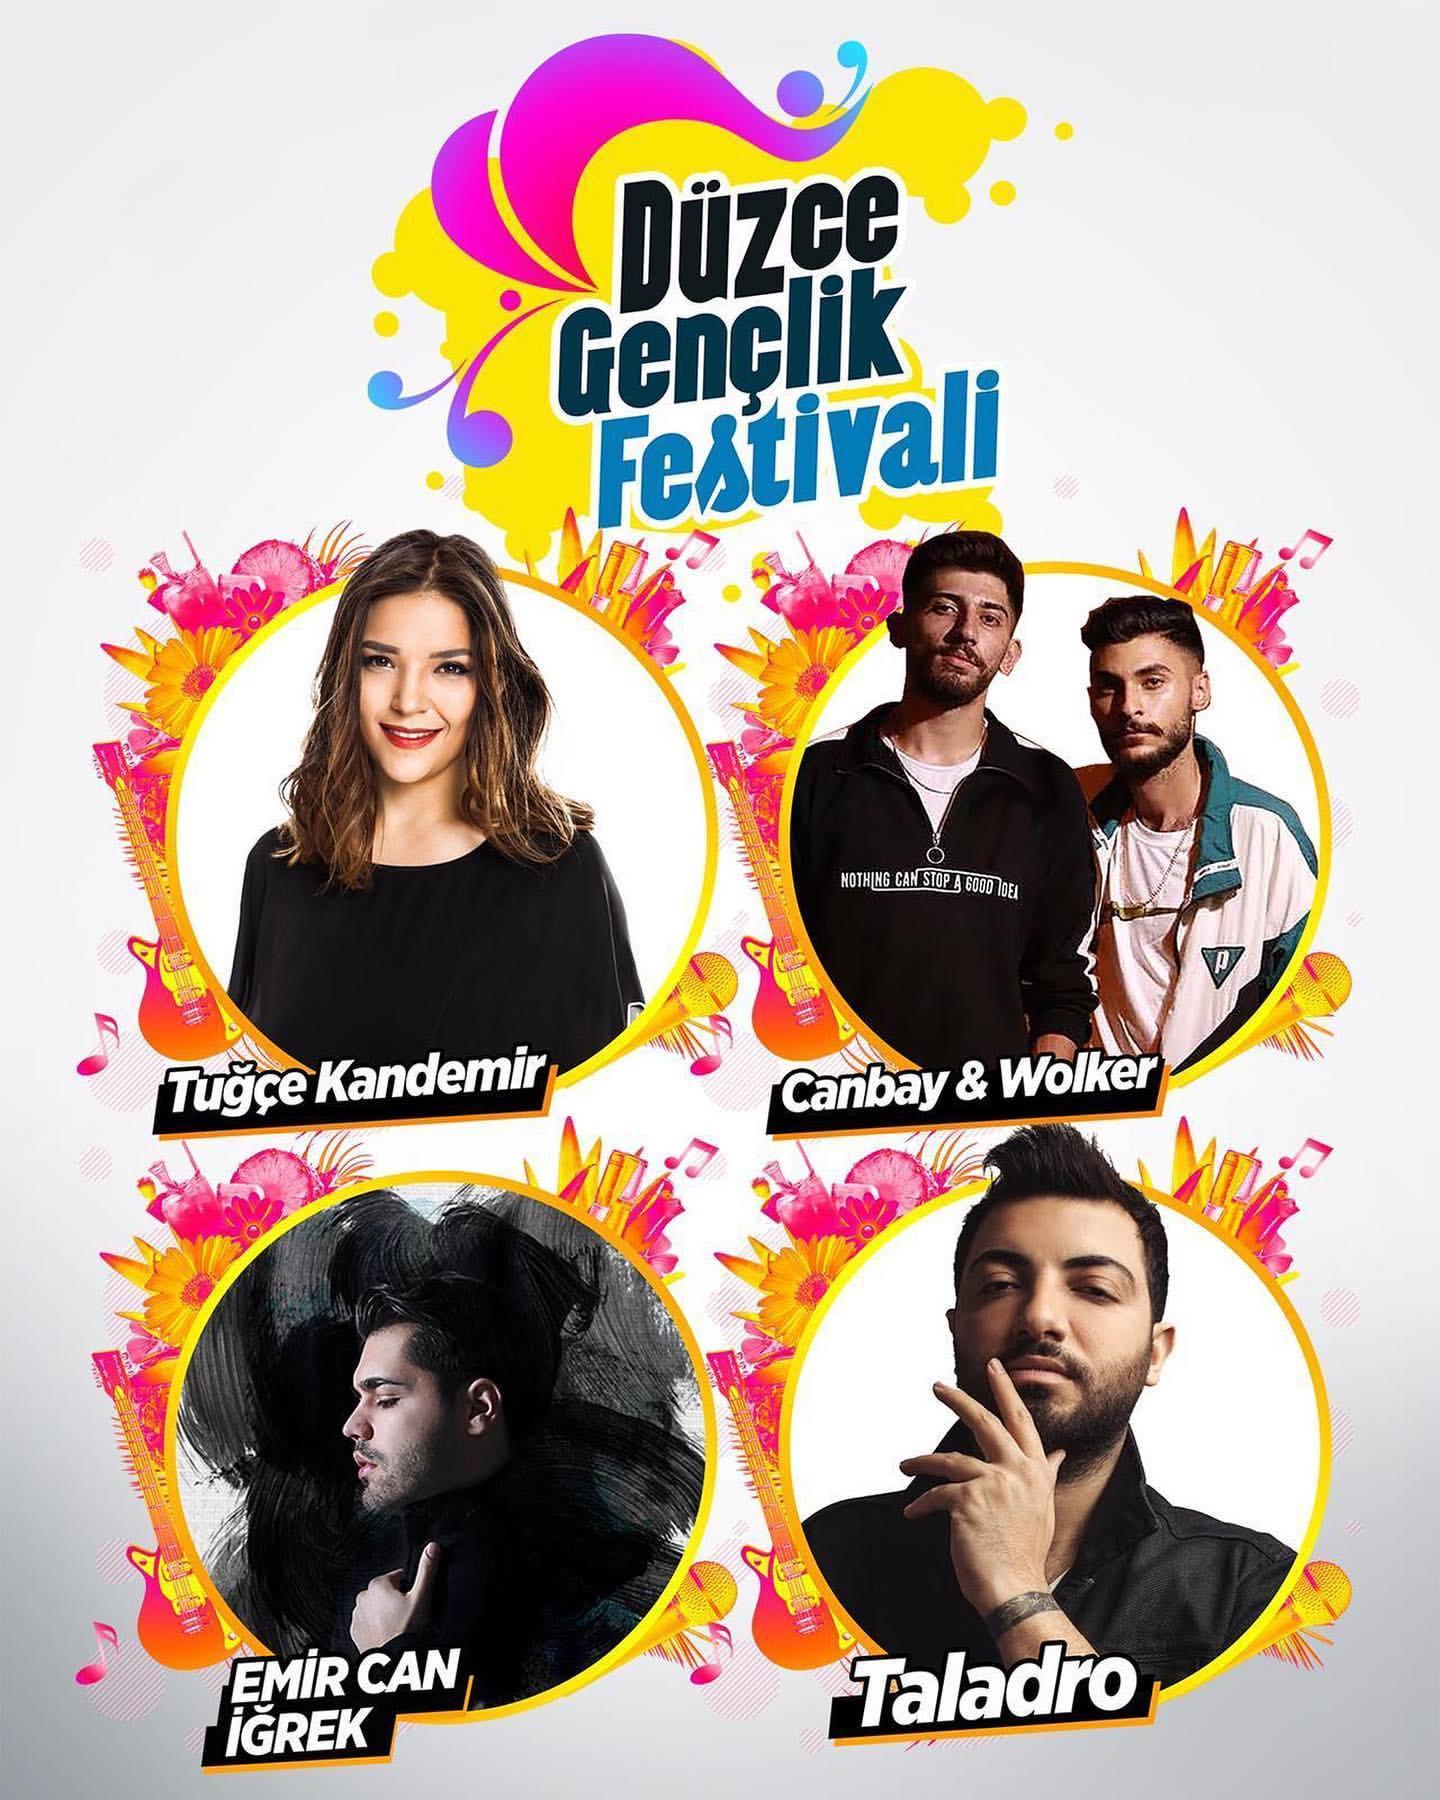 duzce-genclik-festivali